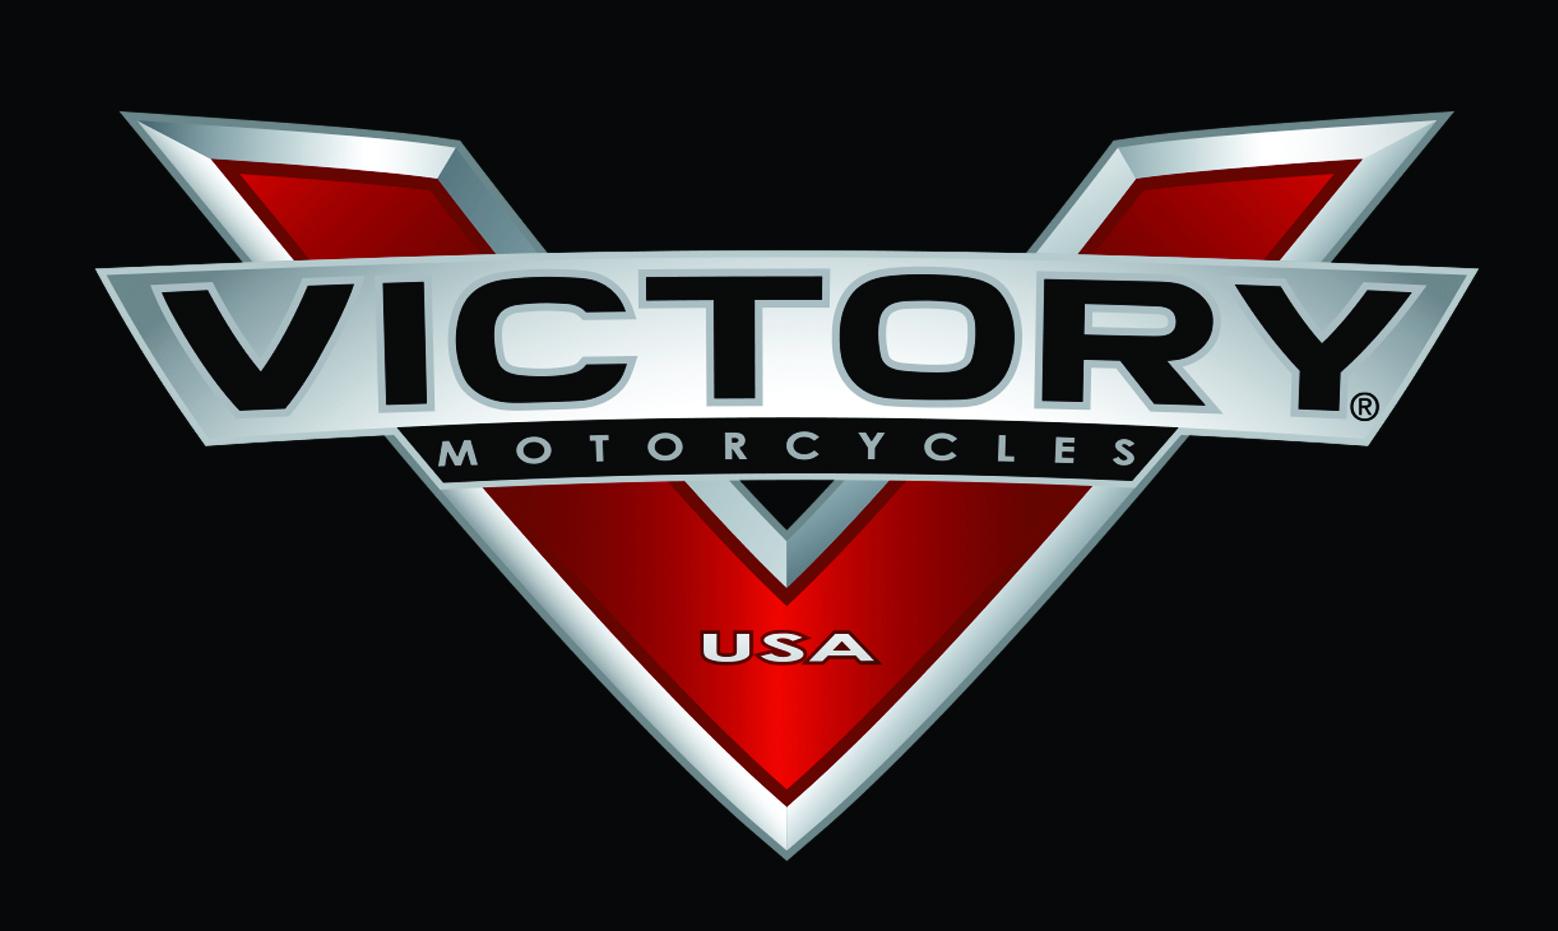 Victory motorcycles Logos.